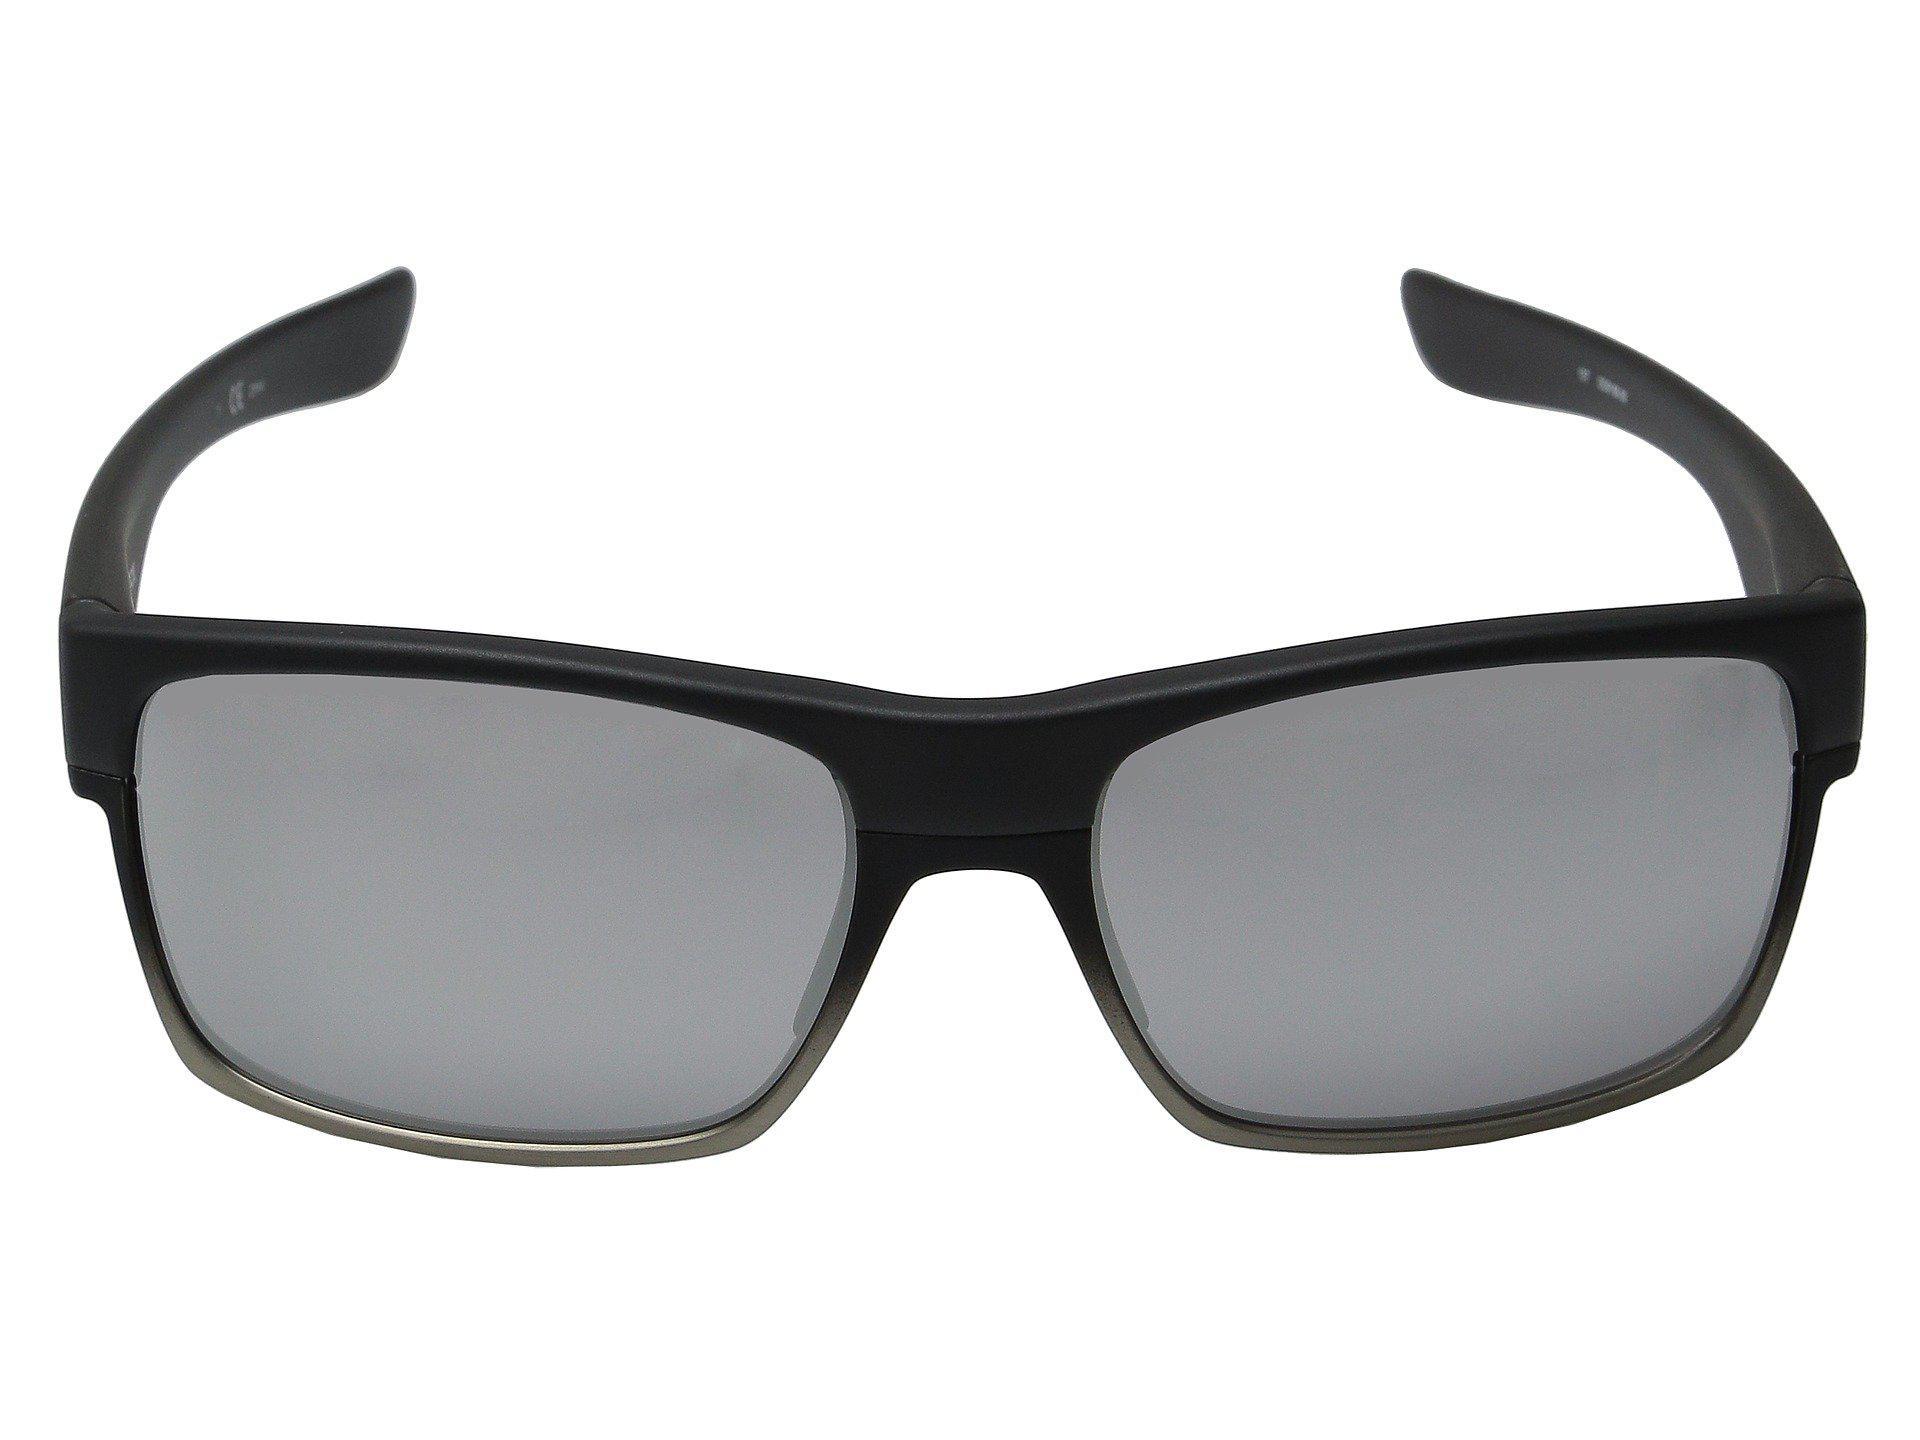 55992d79cf Oakley - Two Face (matte Black grey Polarized) Sport Sunglasses for Men -.  View fullscreen